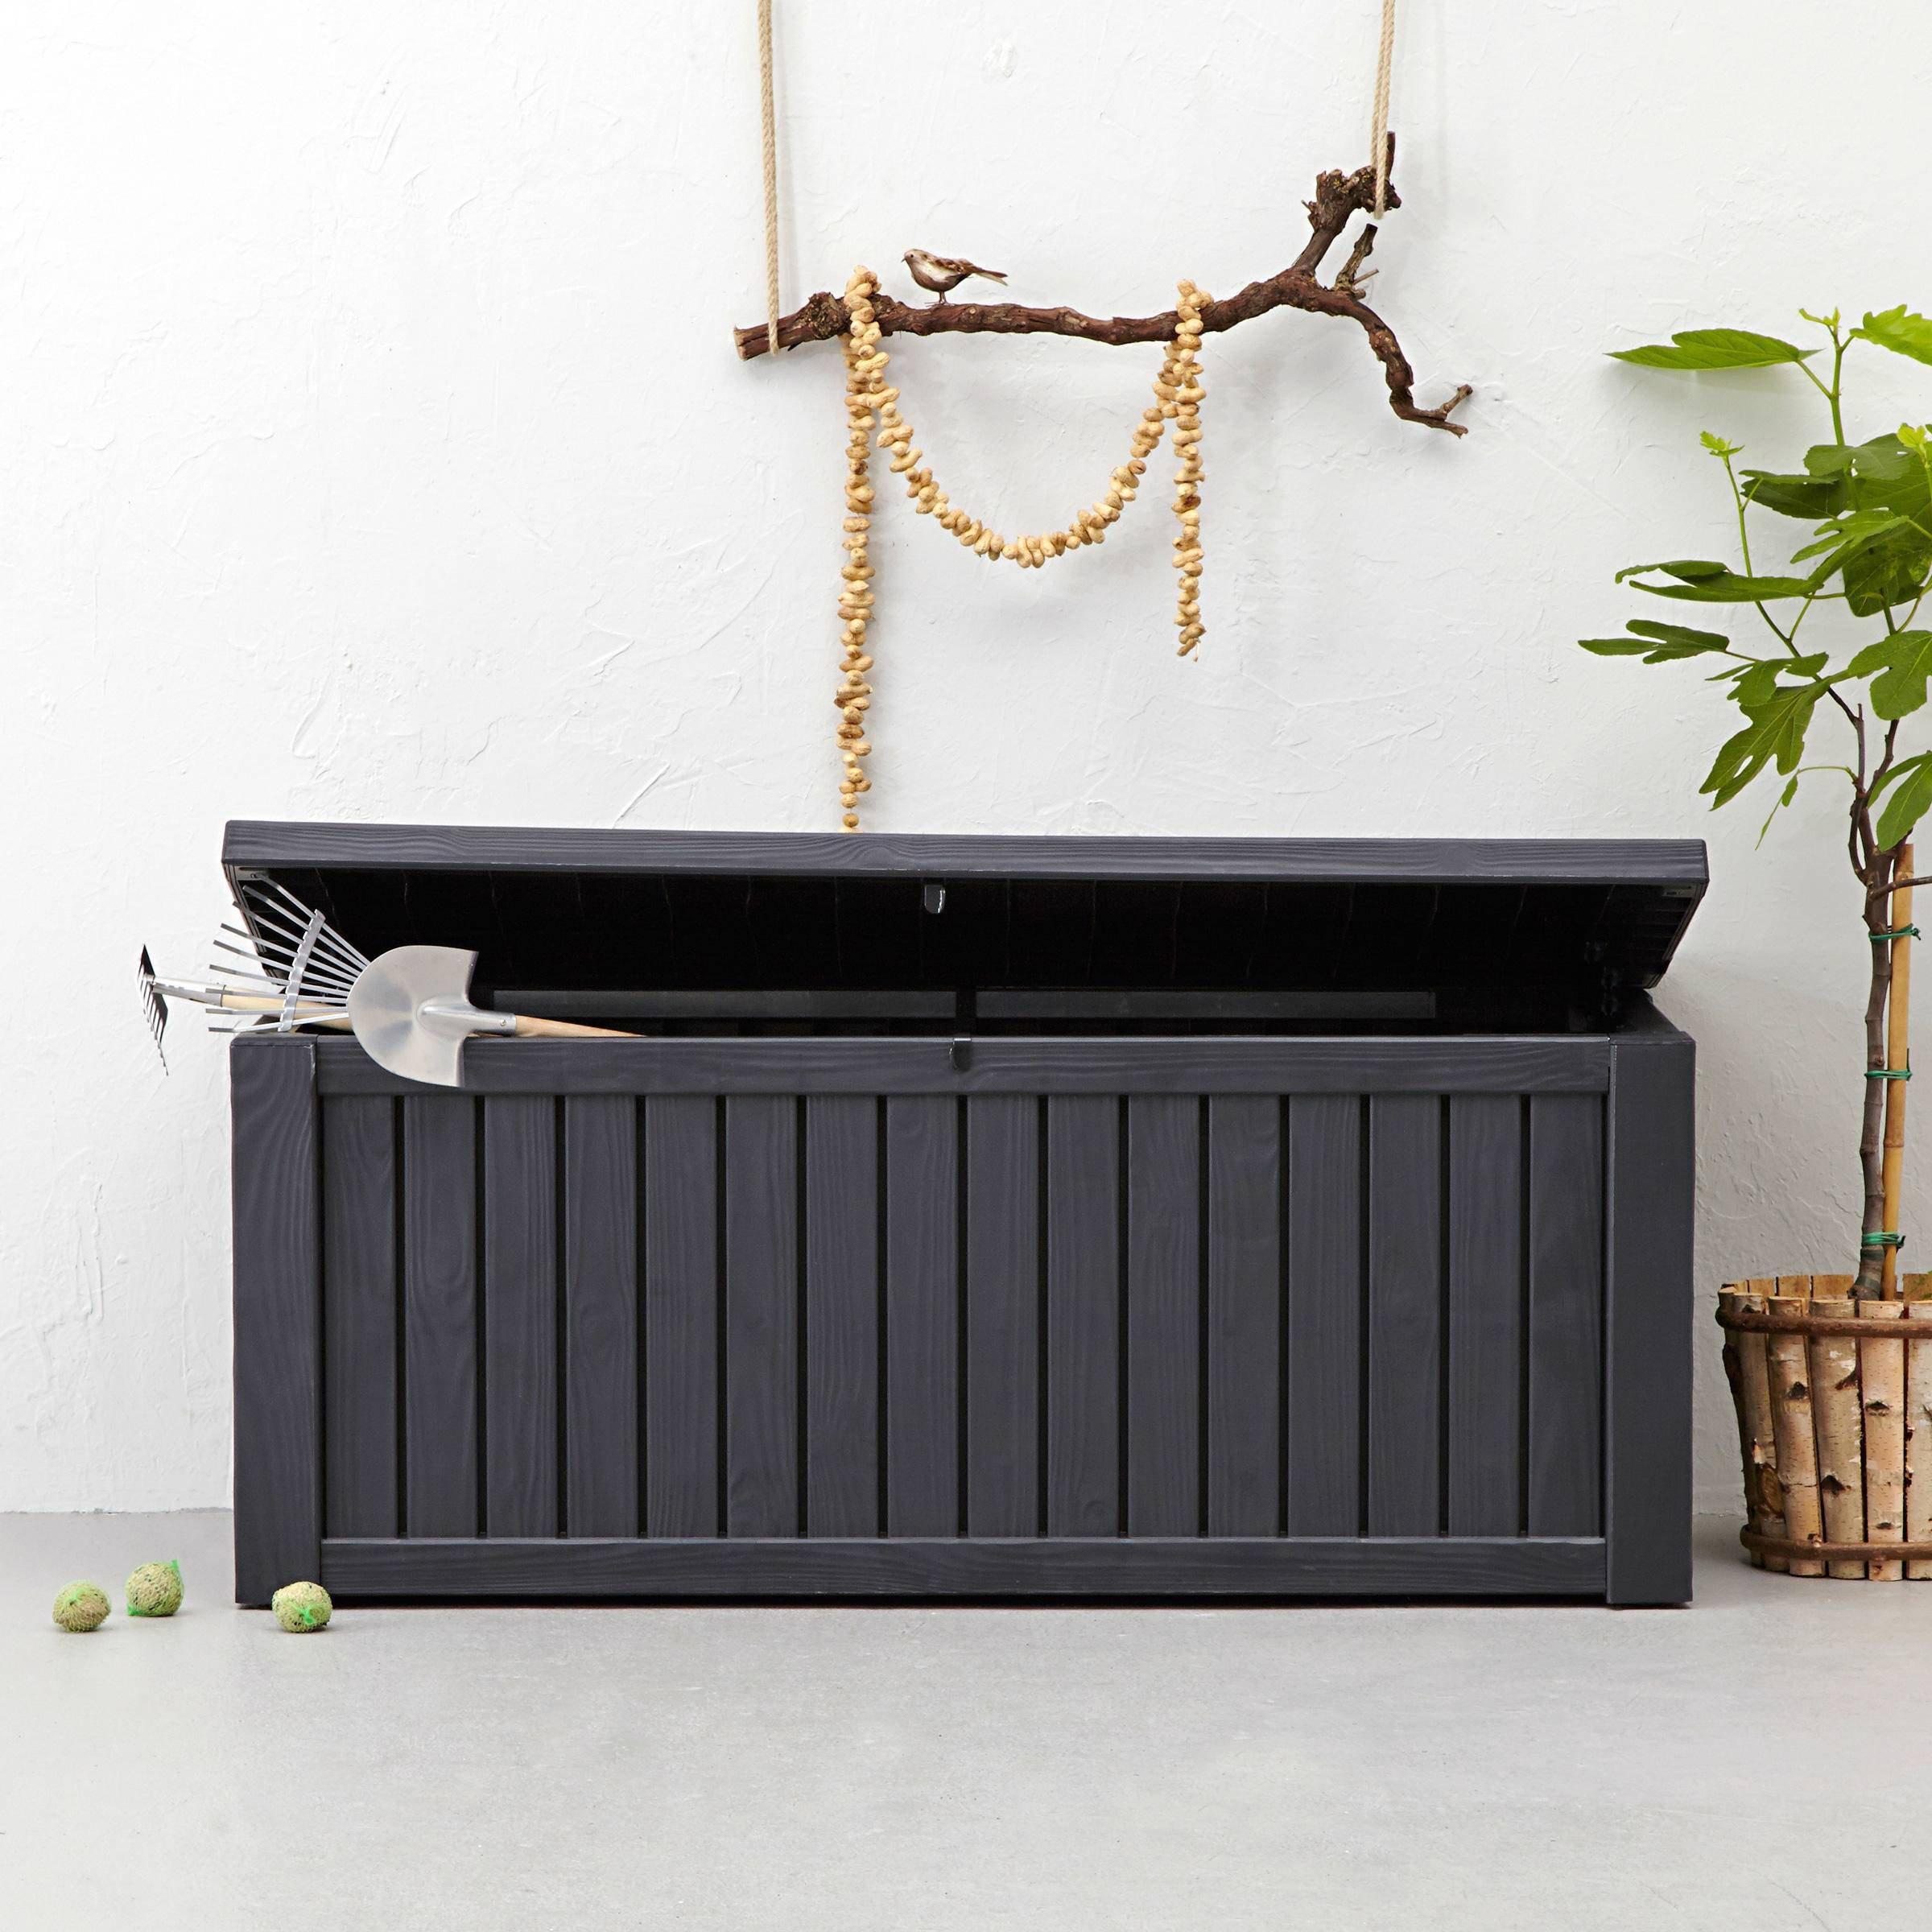 Kussenbox 150 Cm.Rockwood Opbergbox